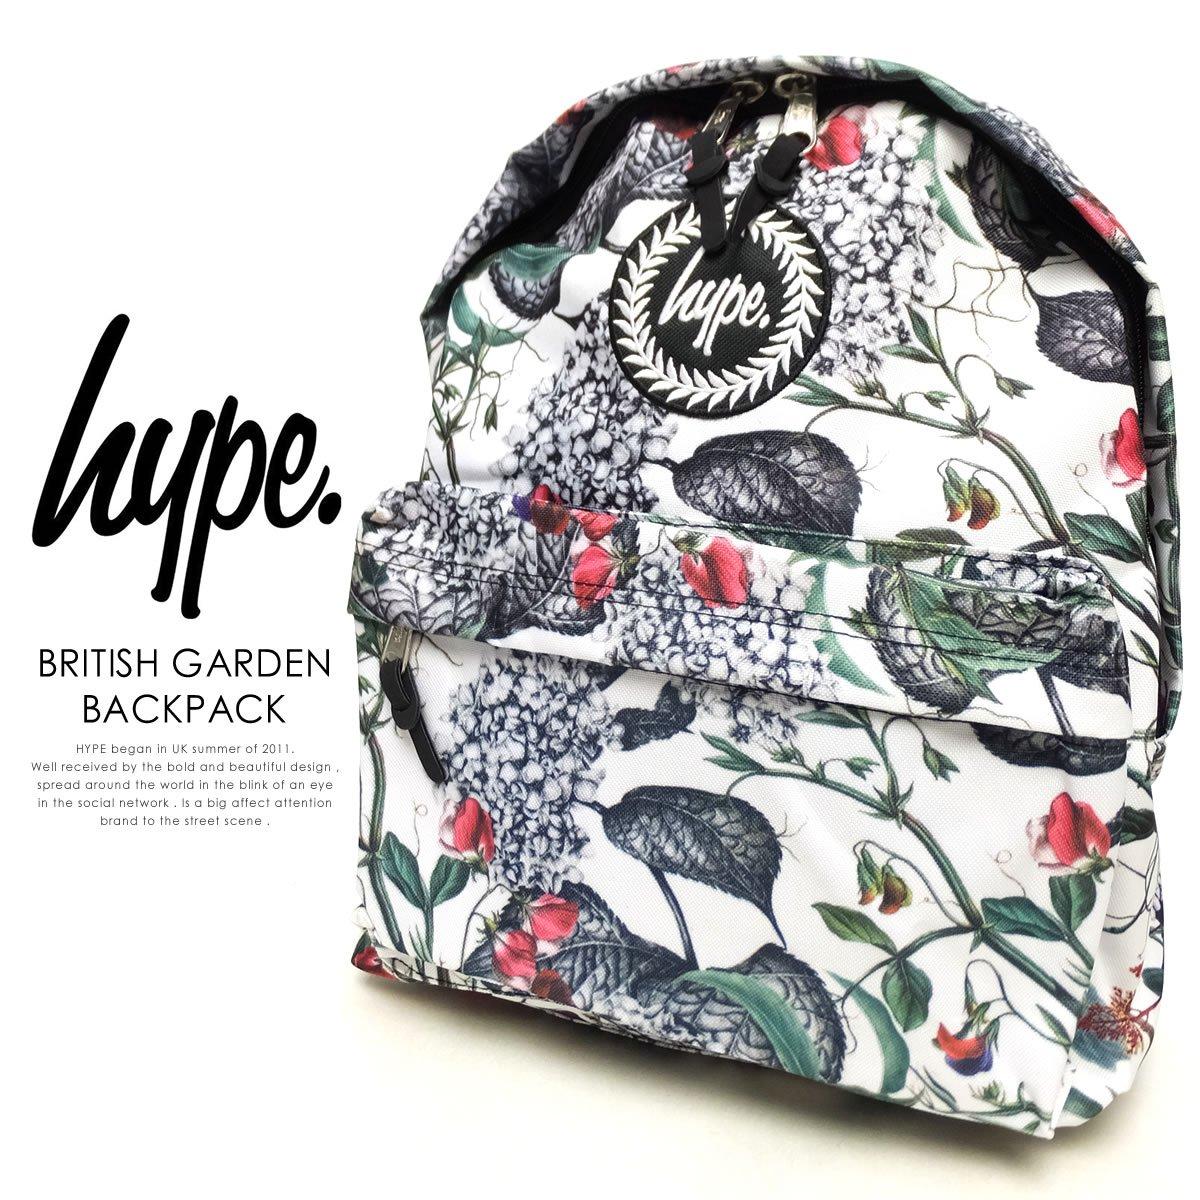 0f1e5b2371f7 ... バックパックが入荷。 http://store.shopping.yahoo.co.jp/deep/hype.html #ハイプ  #ファッションブランド #ストリート #ファッション #リュック #リュックサック ...